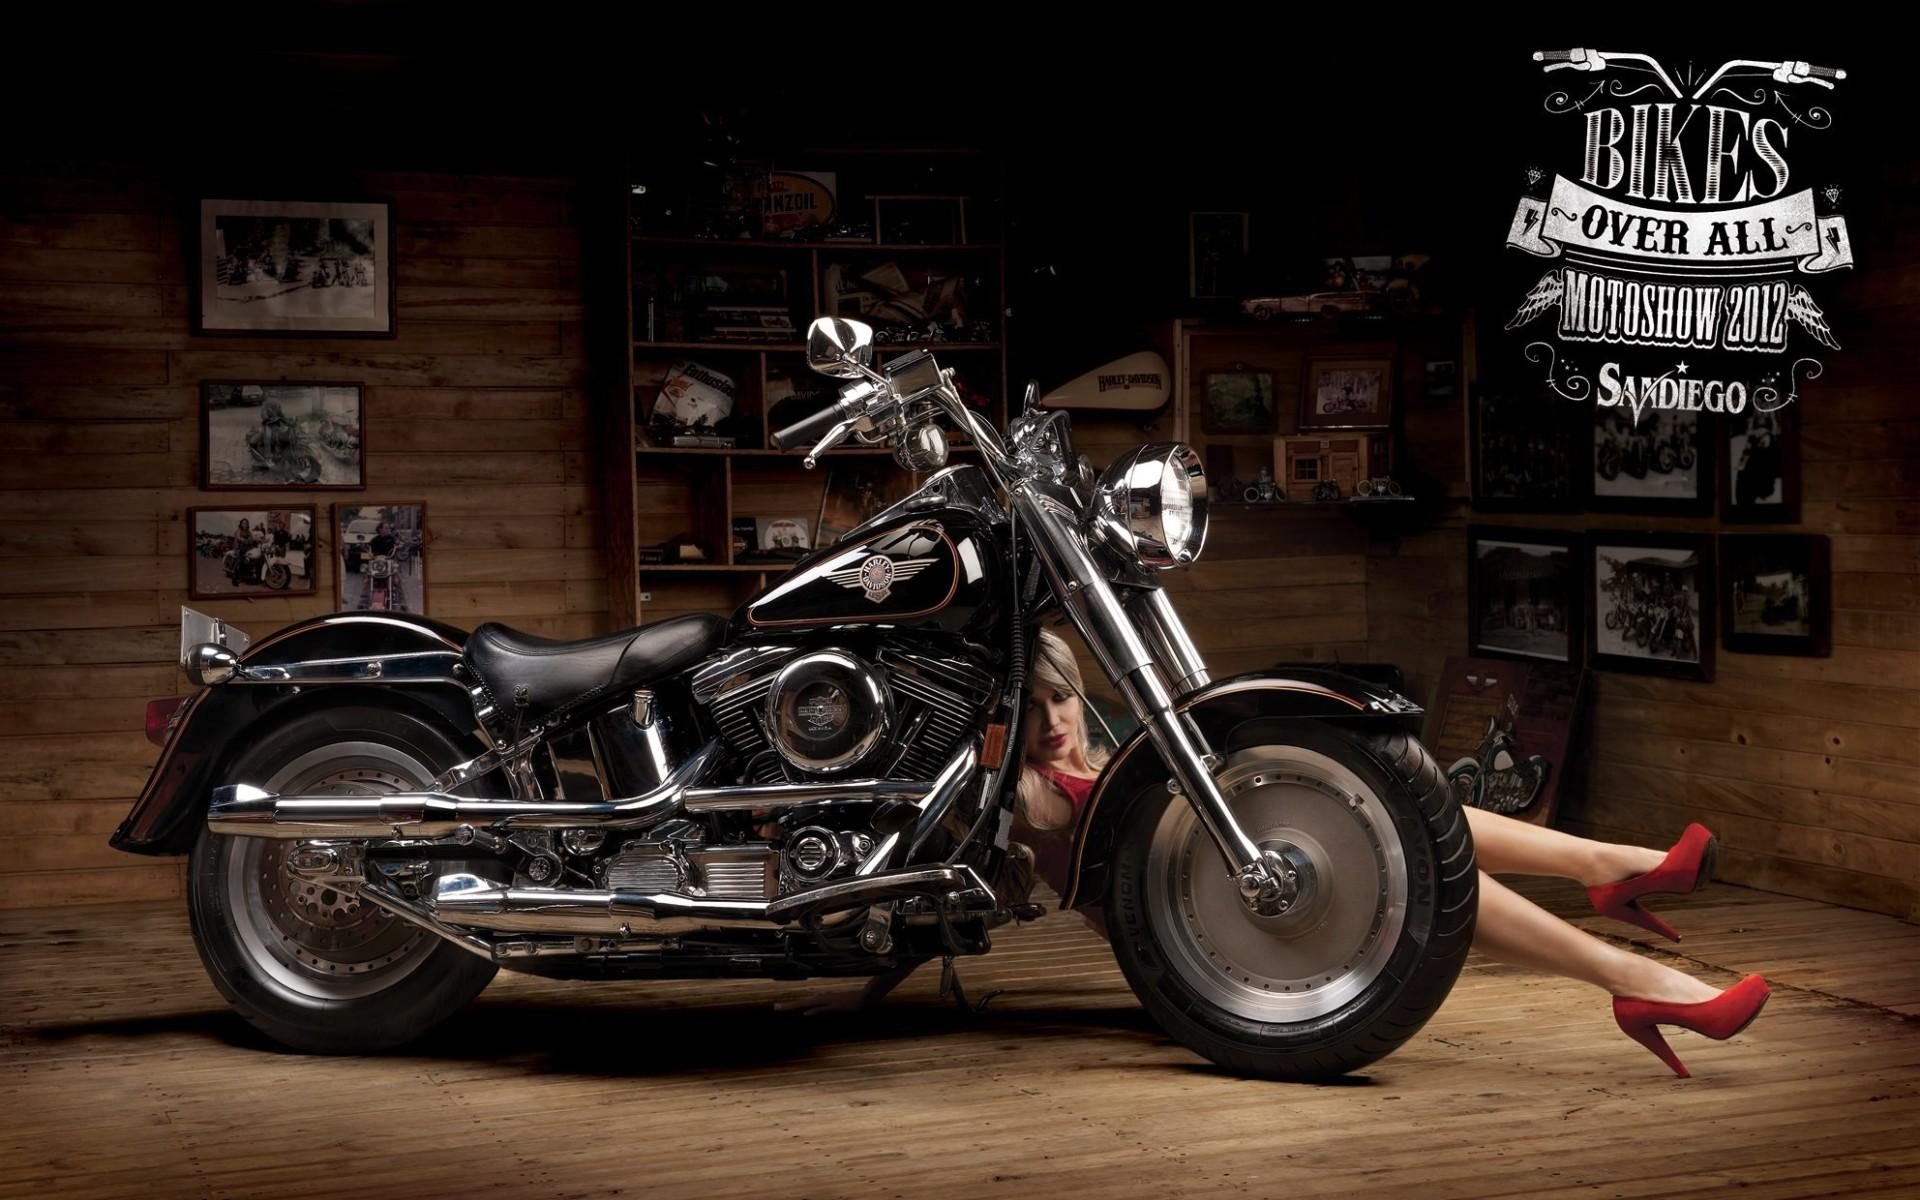 77 Harley Davidson Hd Wallpapers On Wallpapersafari